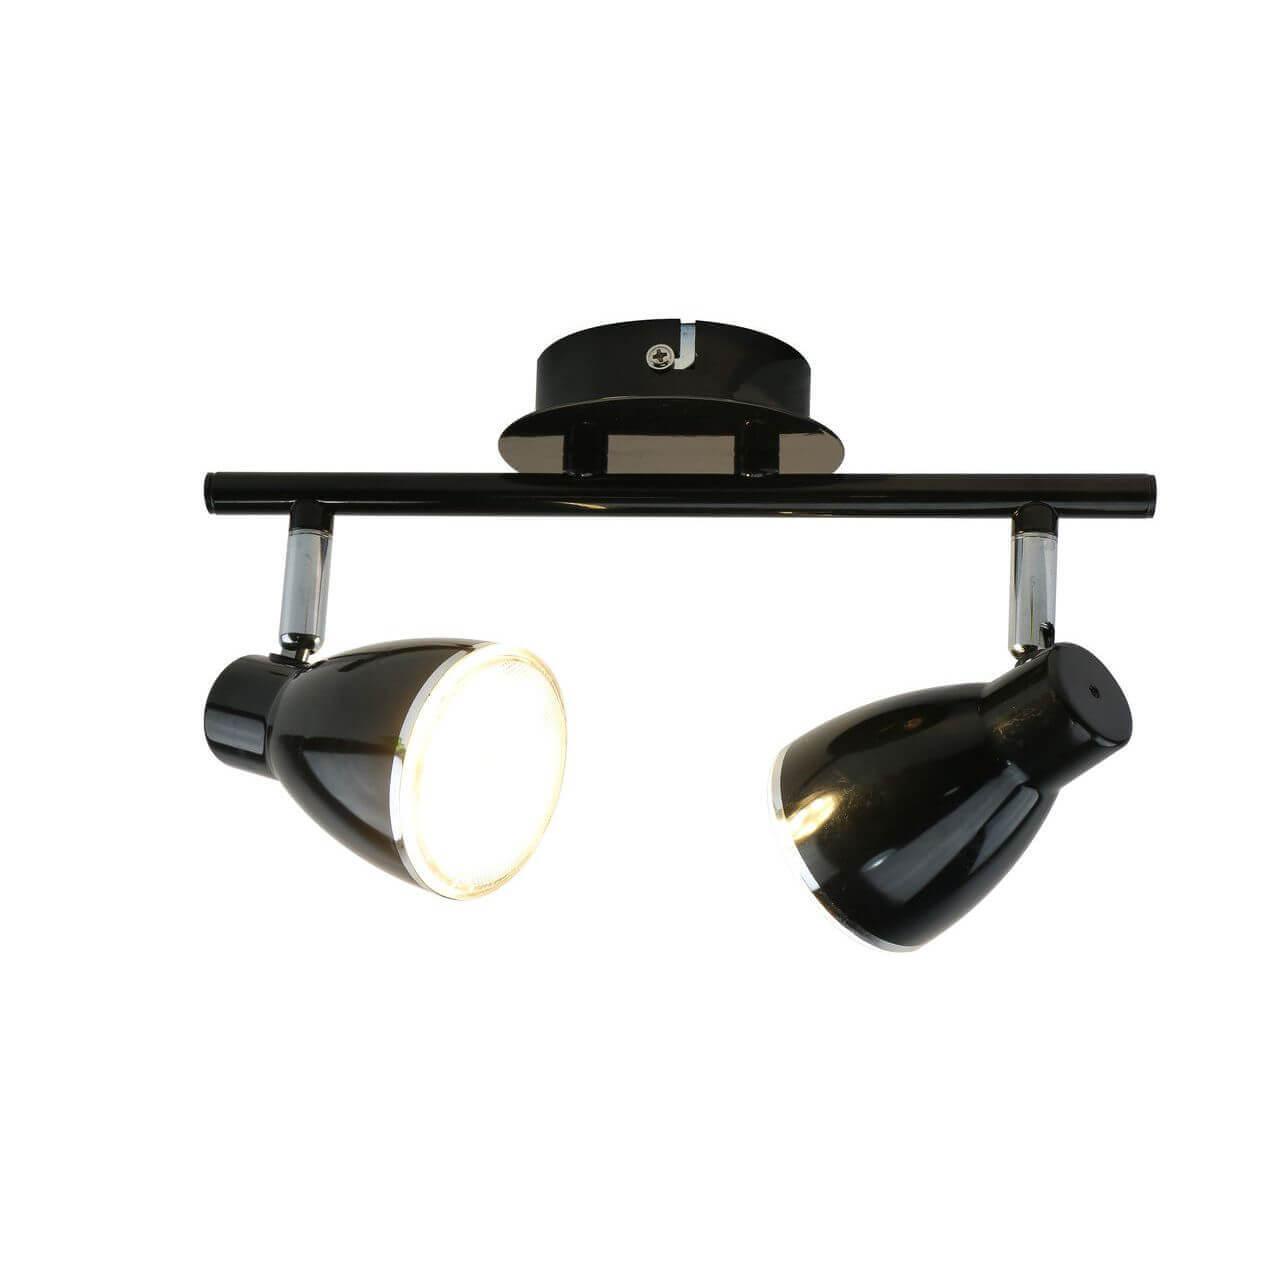 цена на Спот Arte Lamp A6008PL-2BK Gioved Black